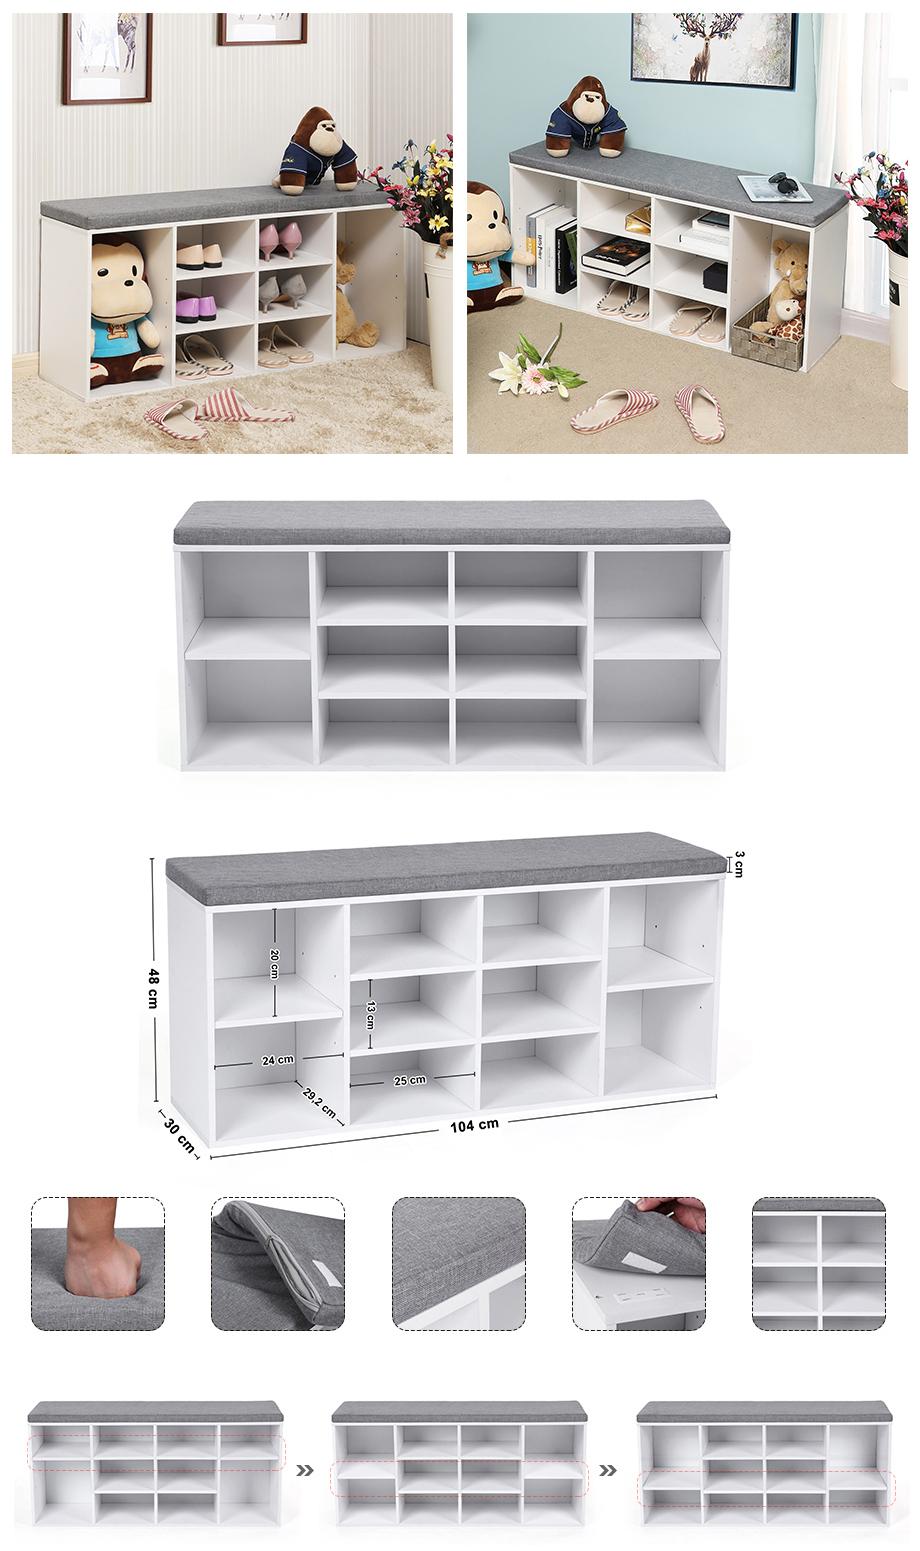 schuhschrank sitzb nke schuhbank schuhregal bank mit. Black Bedroom Furniture Sets. Home Design Ideas